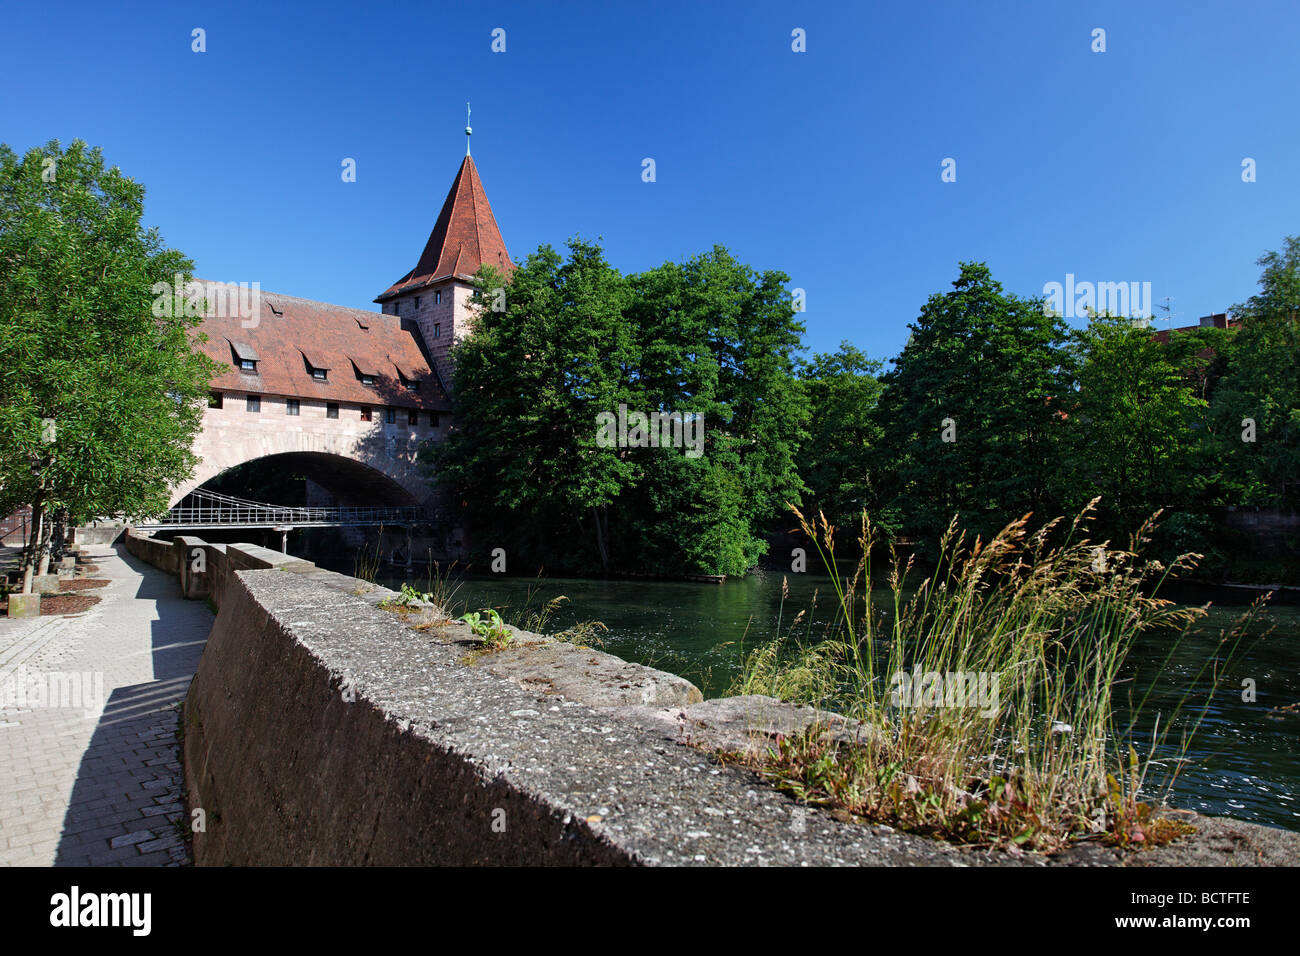 Waterside promenade with Hallertor gate, Kettensteg bridge, and Schlayerturm tower, Pegnitz river, bridge, trees, - Stock Image